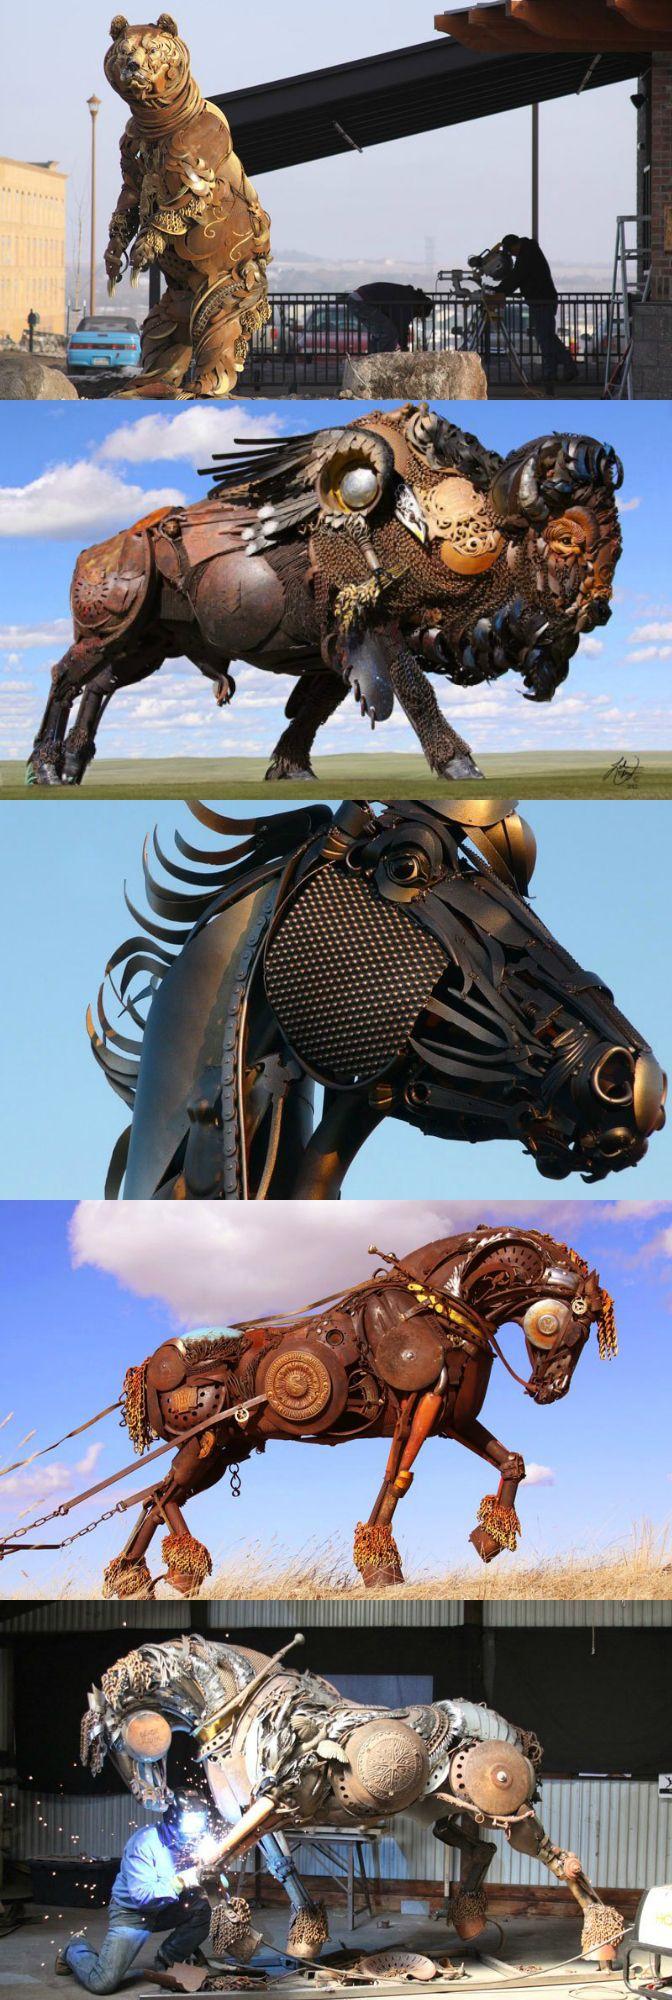 The Incredible Scrap Metal Animal #Sculptures of John Lopez